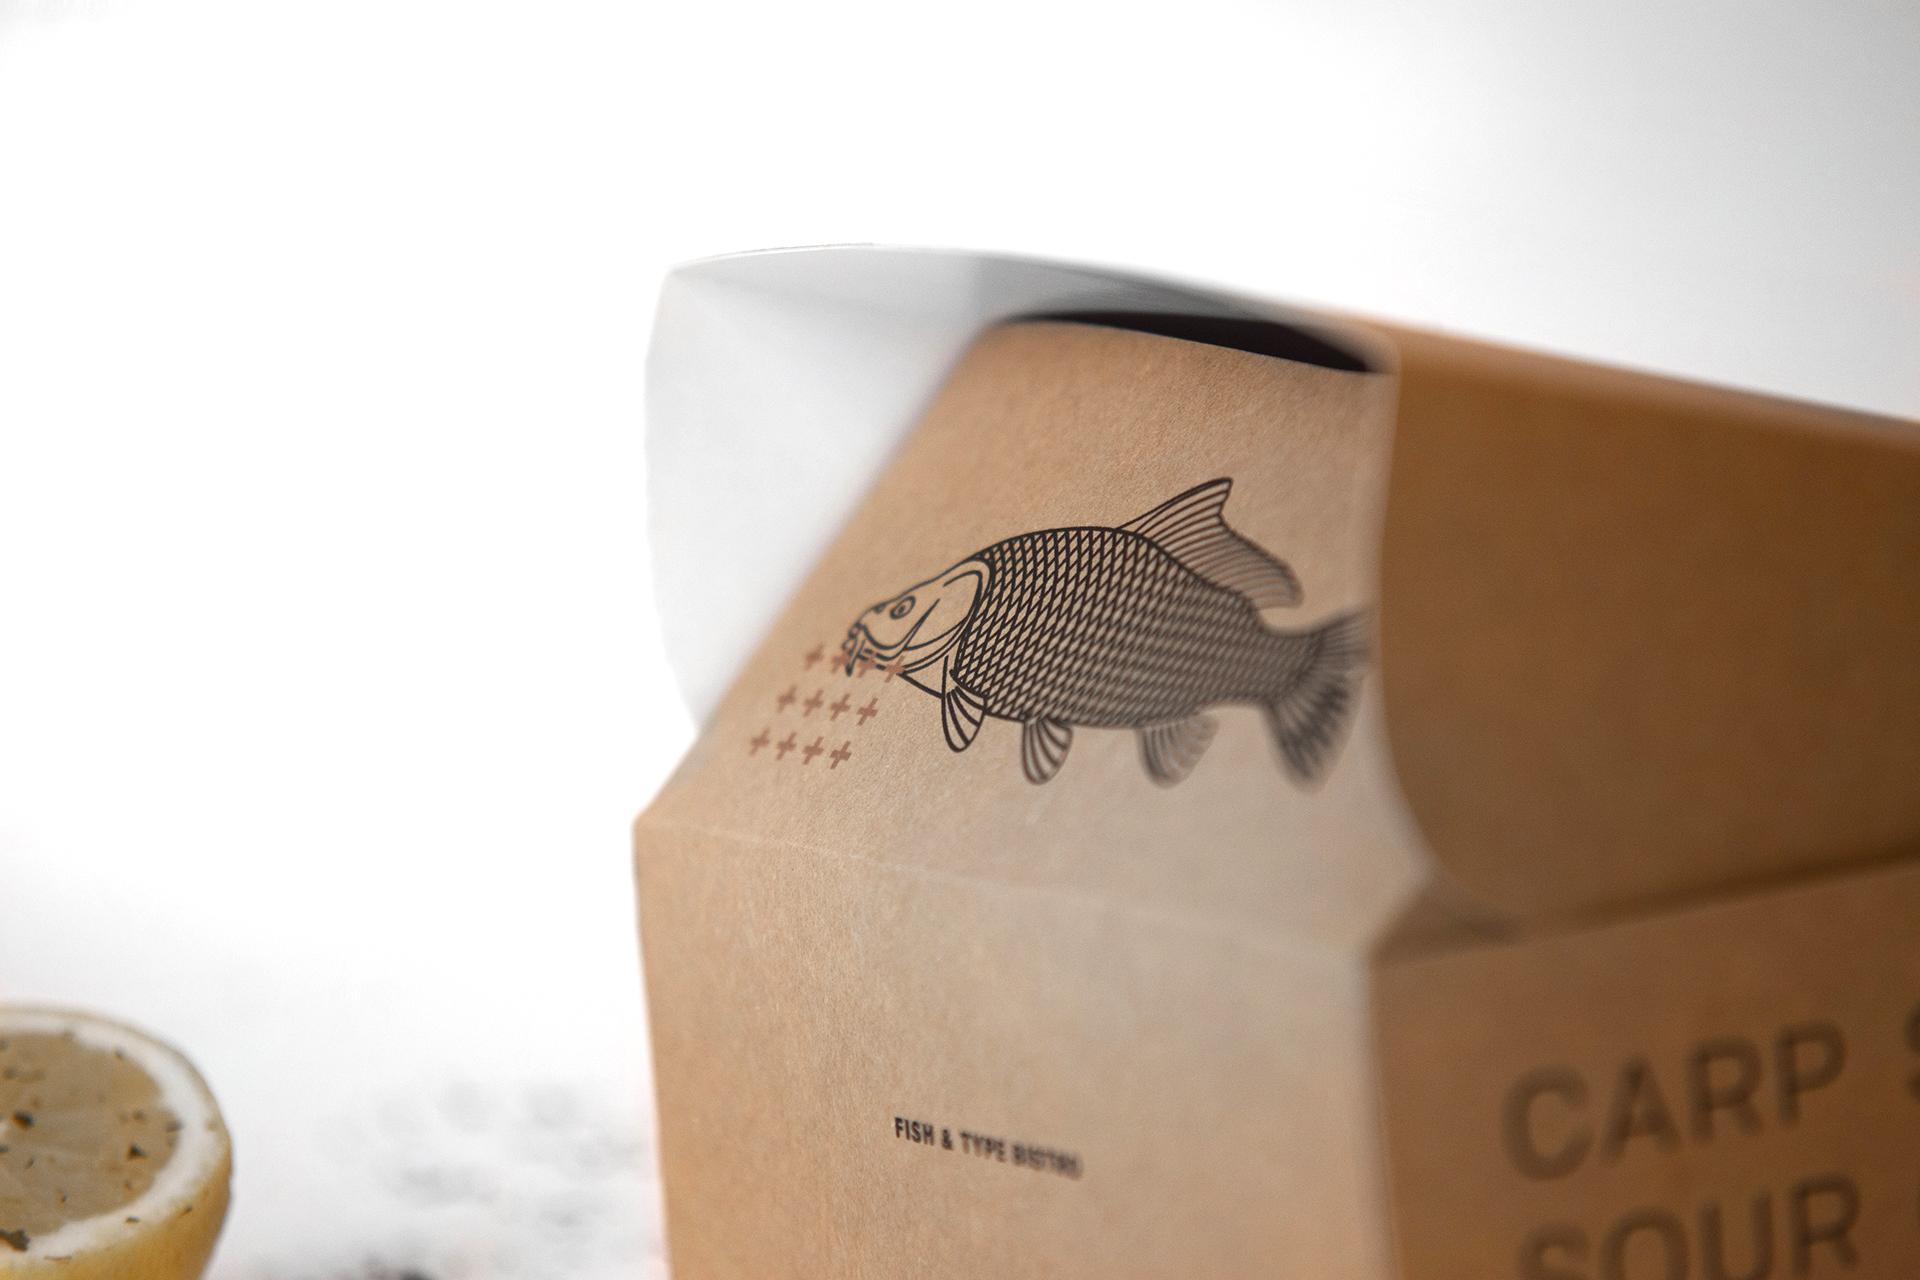 Zsolt Kolcsar - Fish &Type Bistro22.jpg